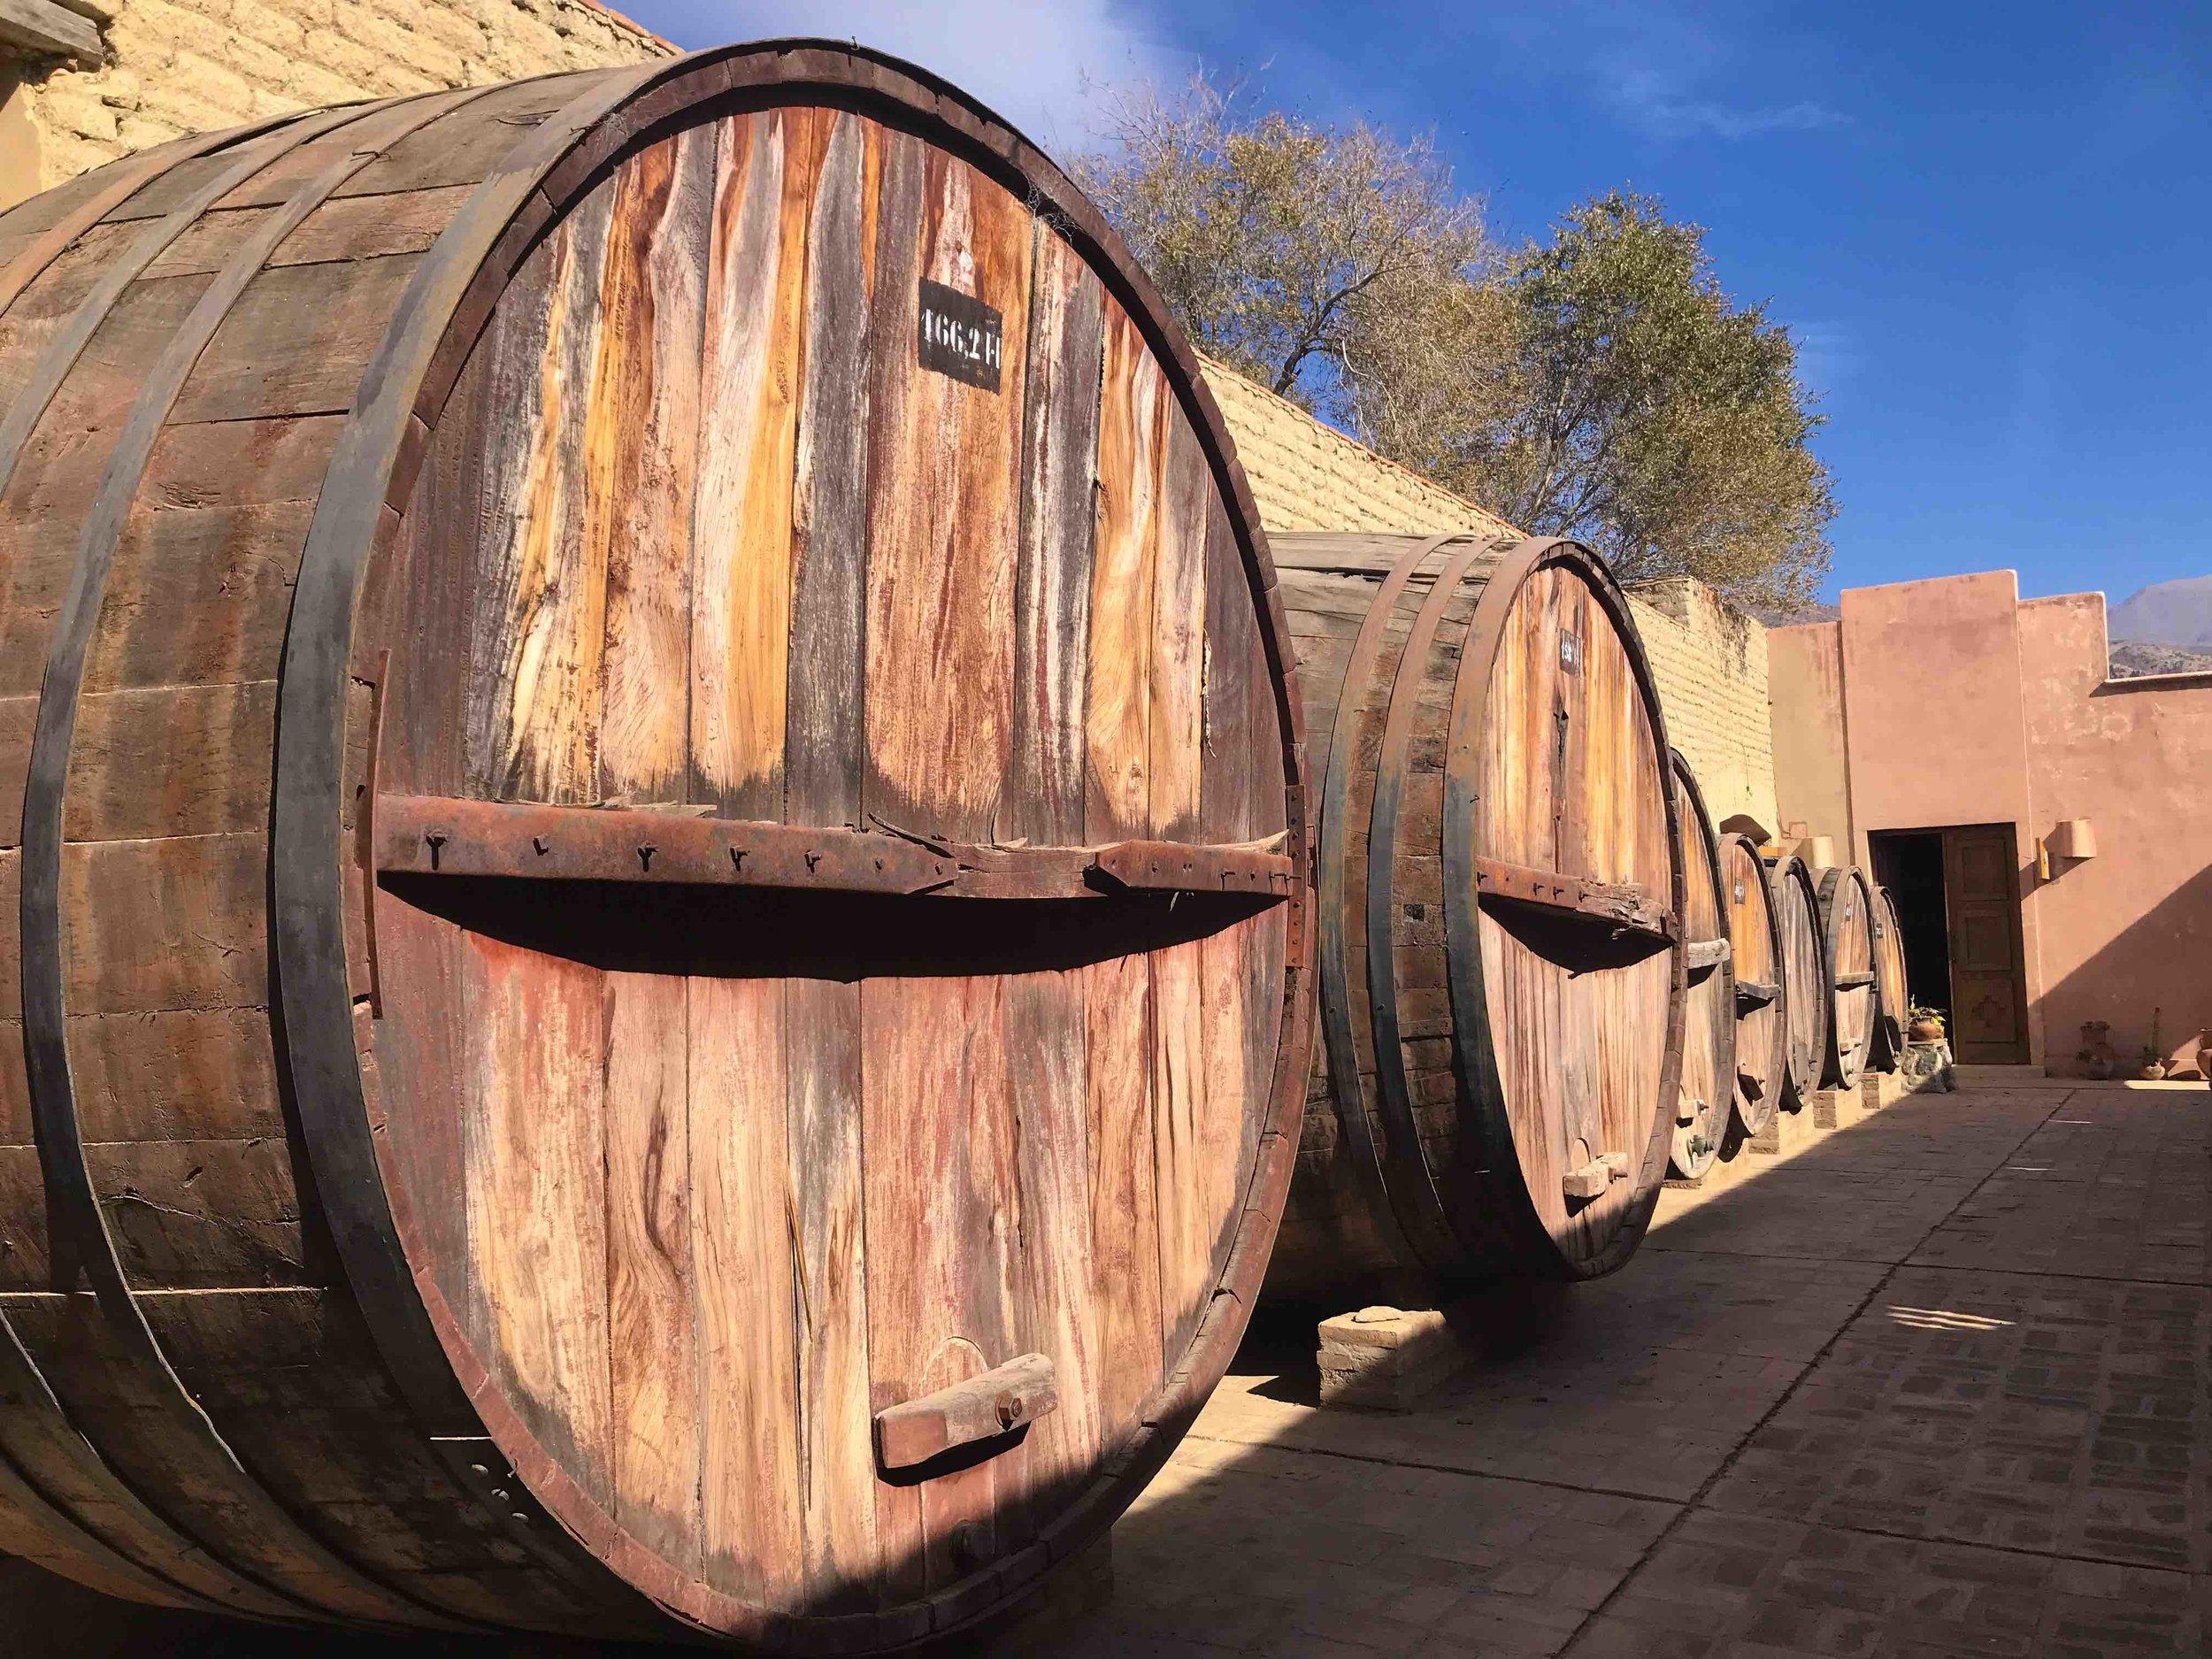 El Porvenir Colonial Wine Barrels in Cafayate, Argentina.